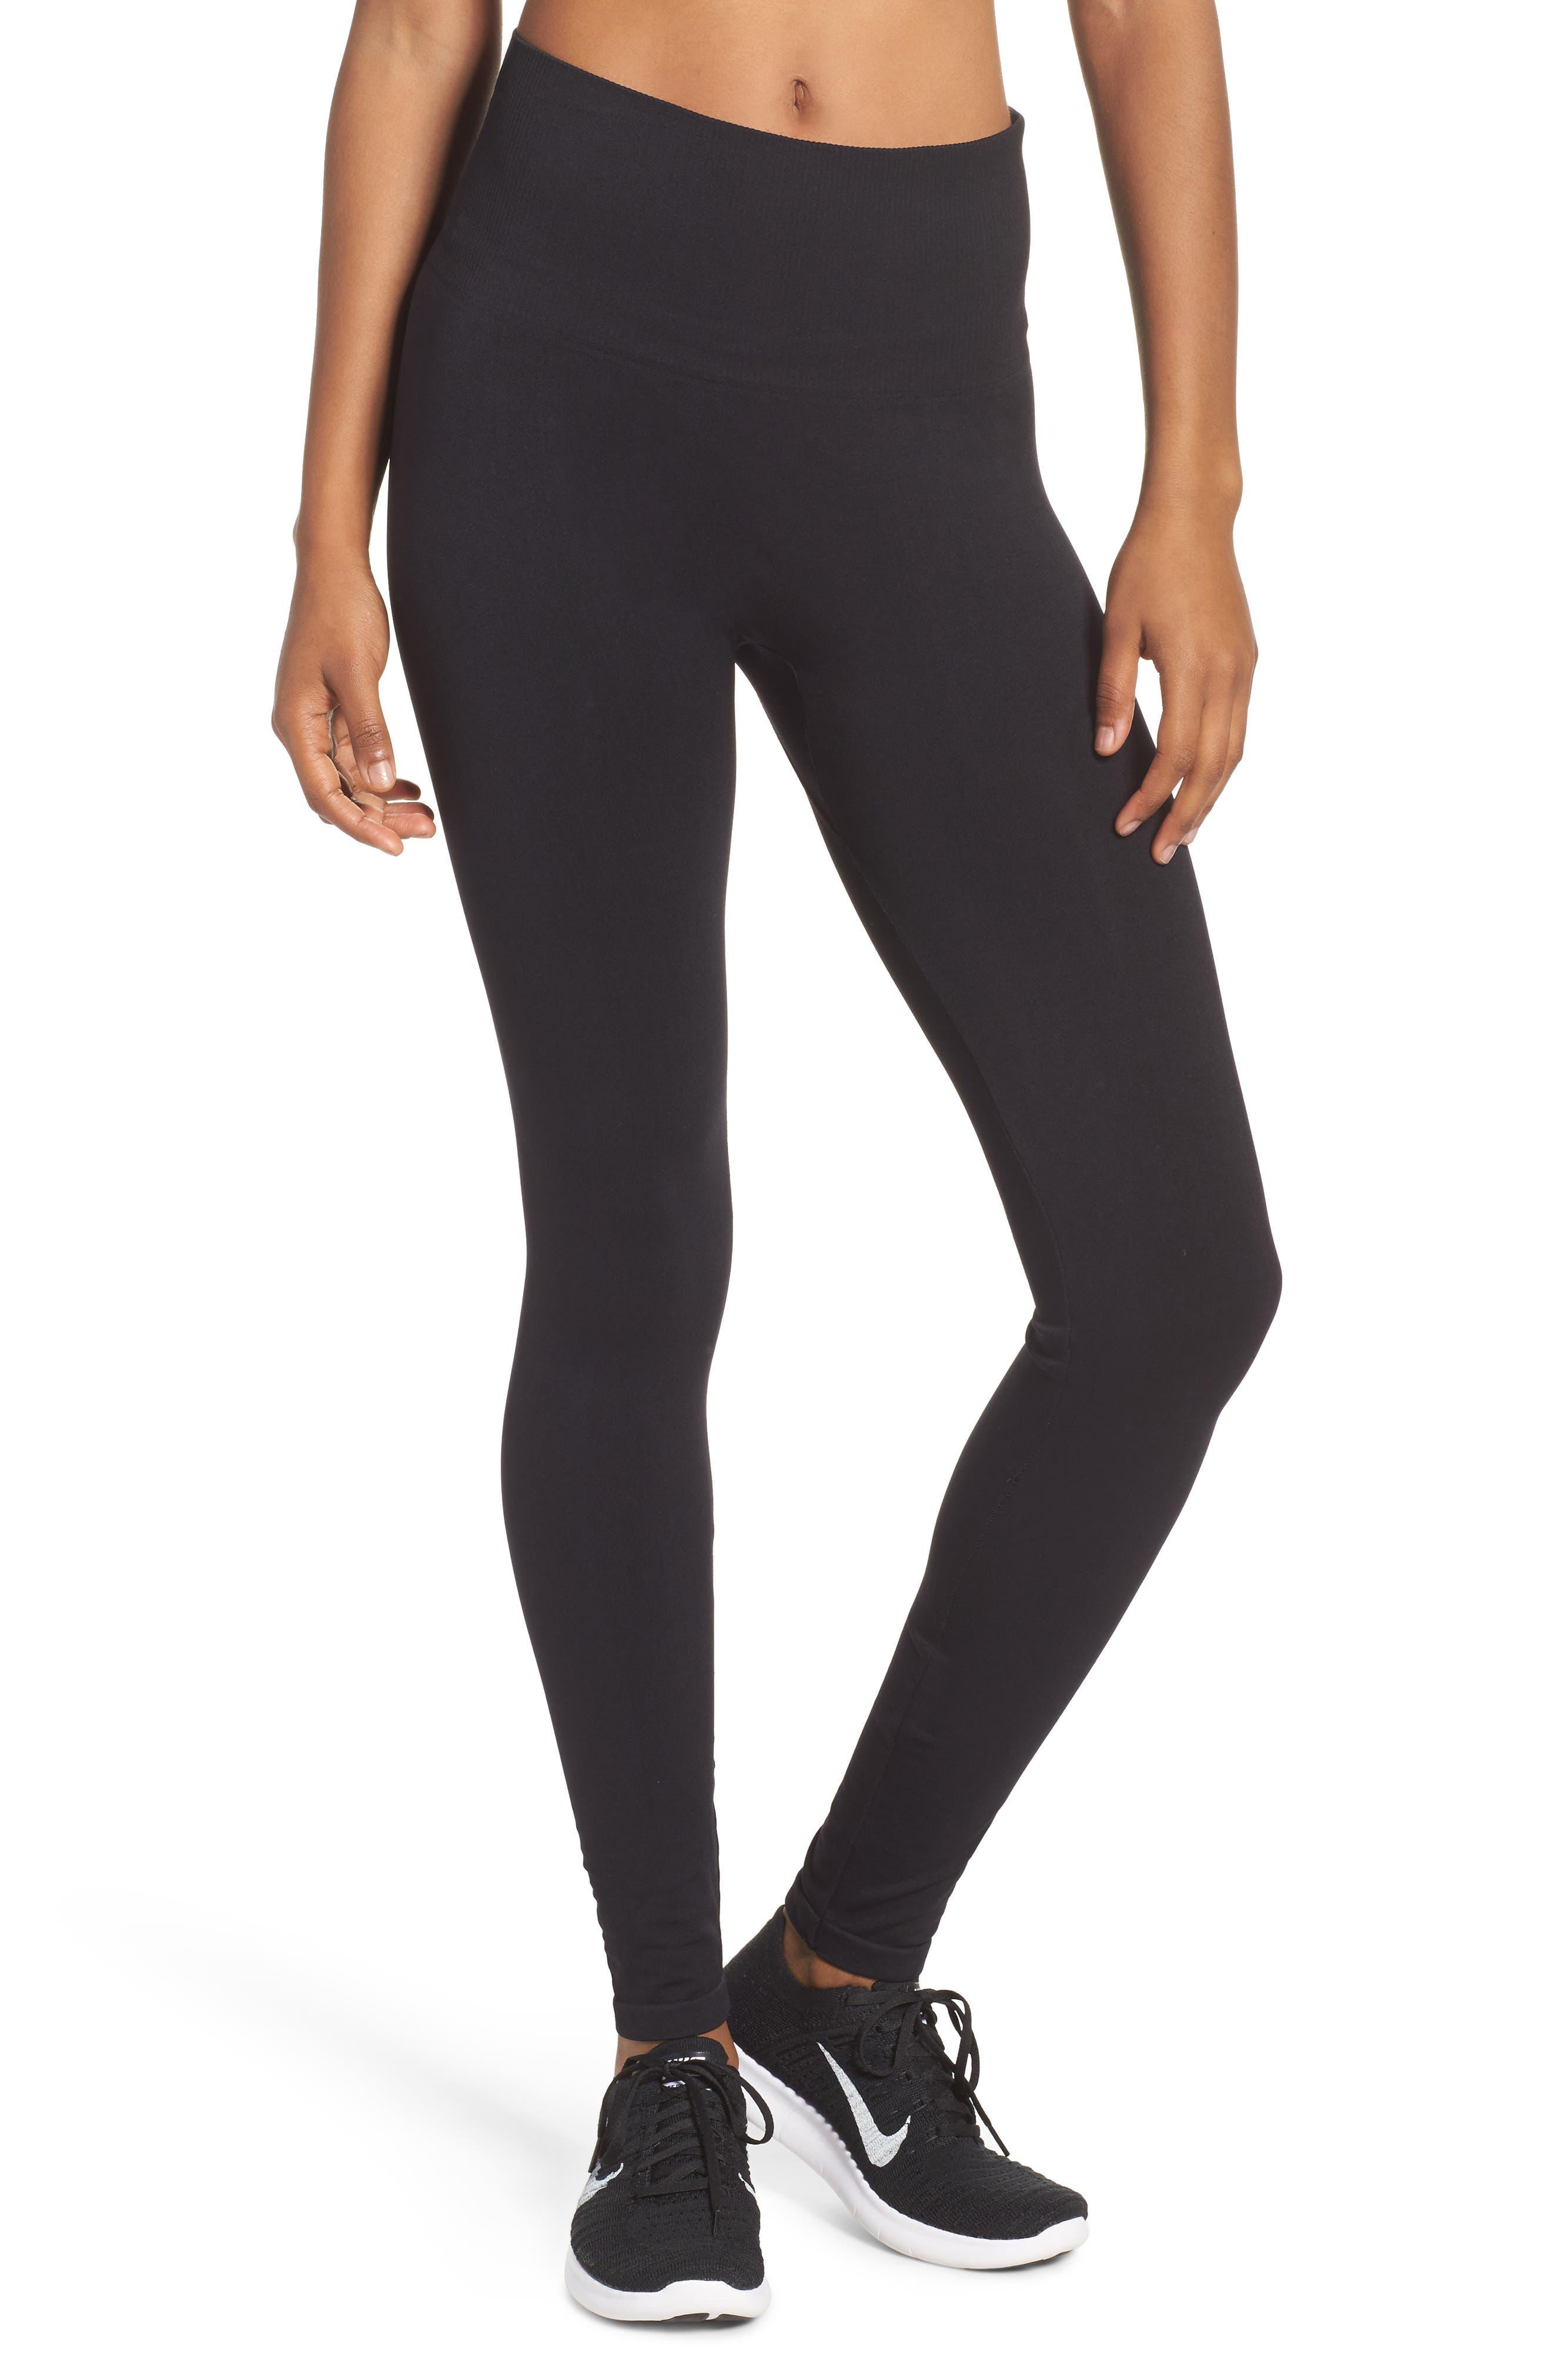 Alternate Image 1 Selected - Climawear Staple High Waist Leggings